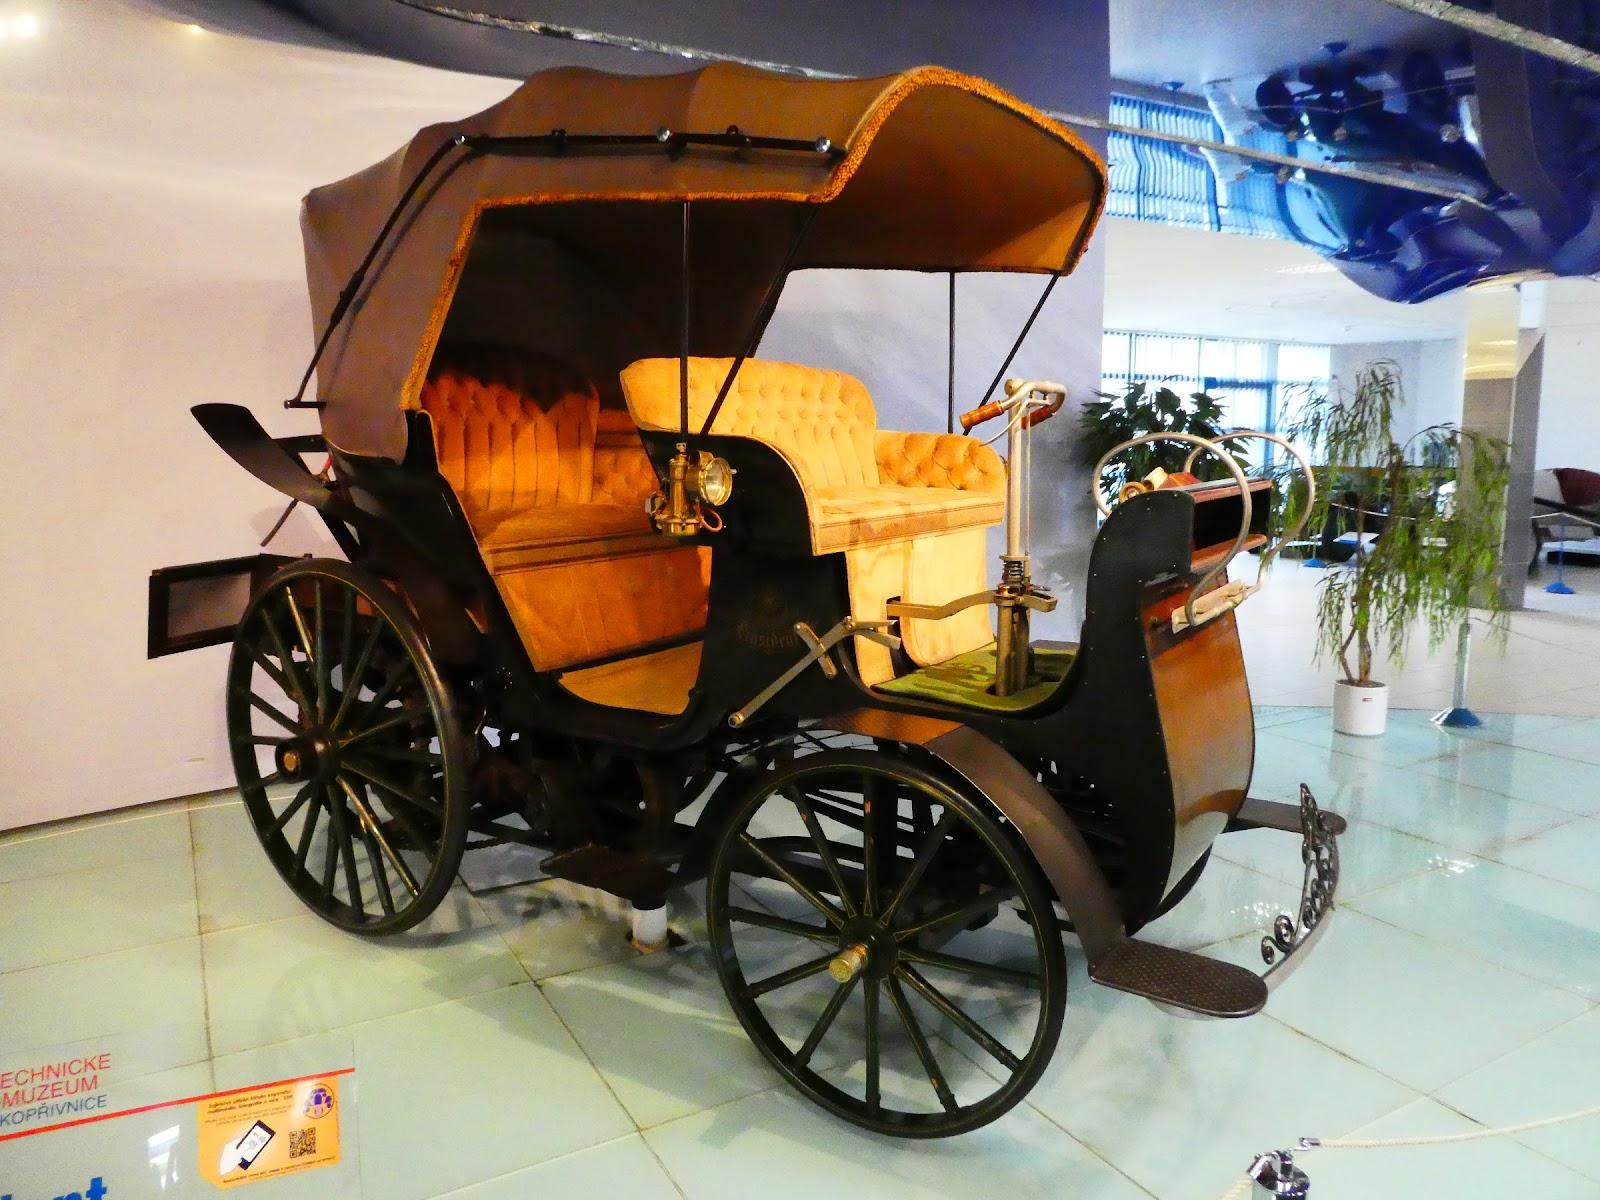 Heinkel Scooter Project: Tatra Museum, Koprivince